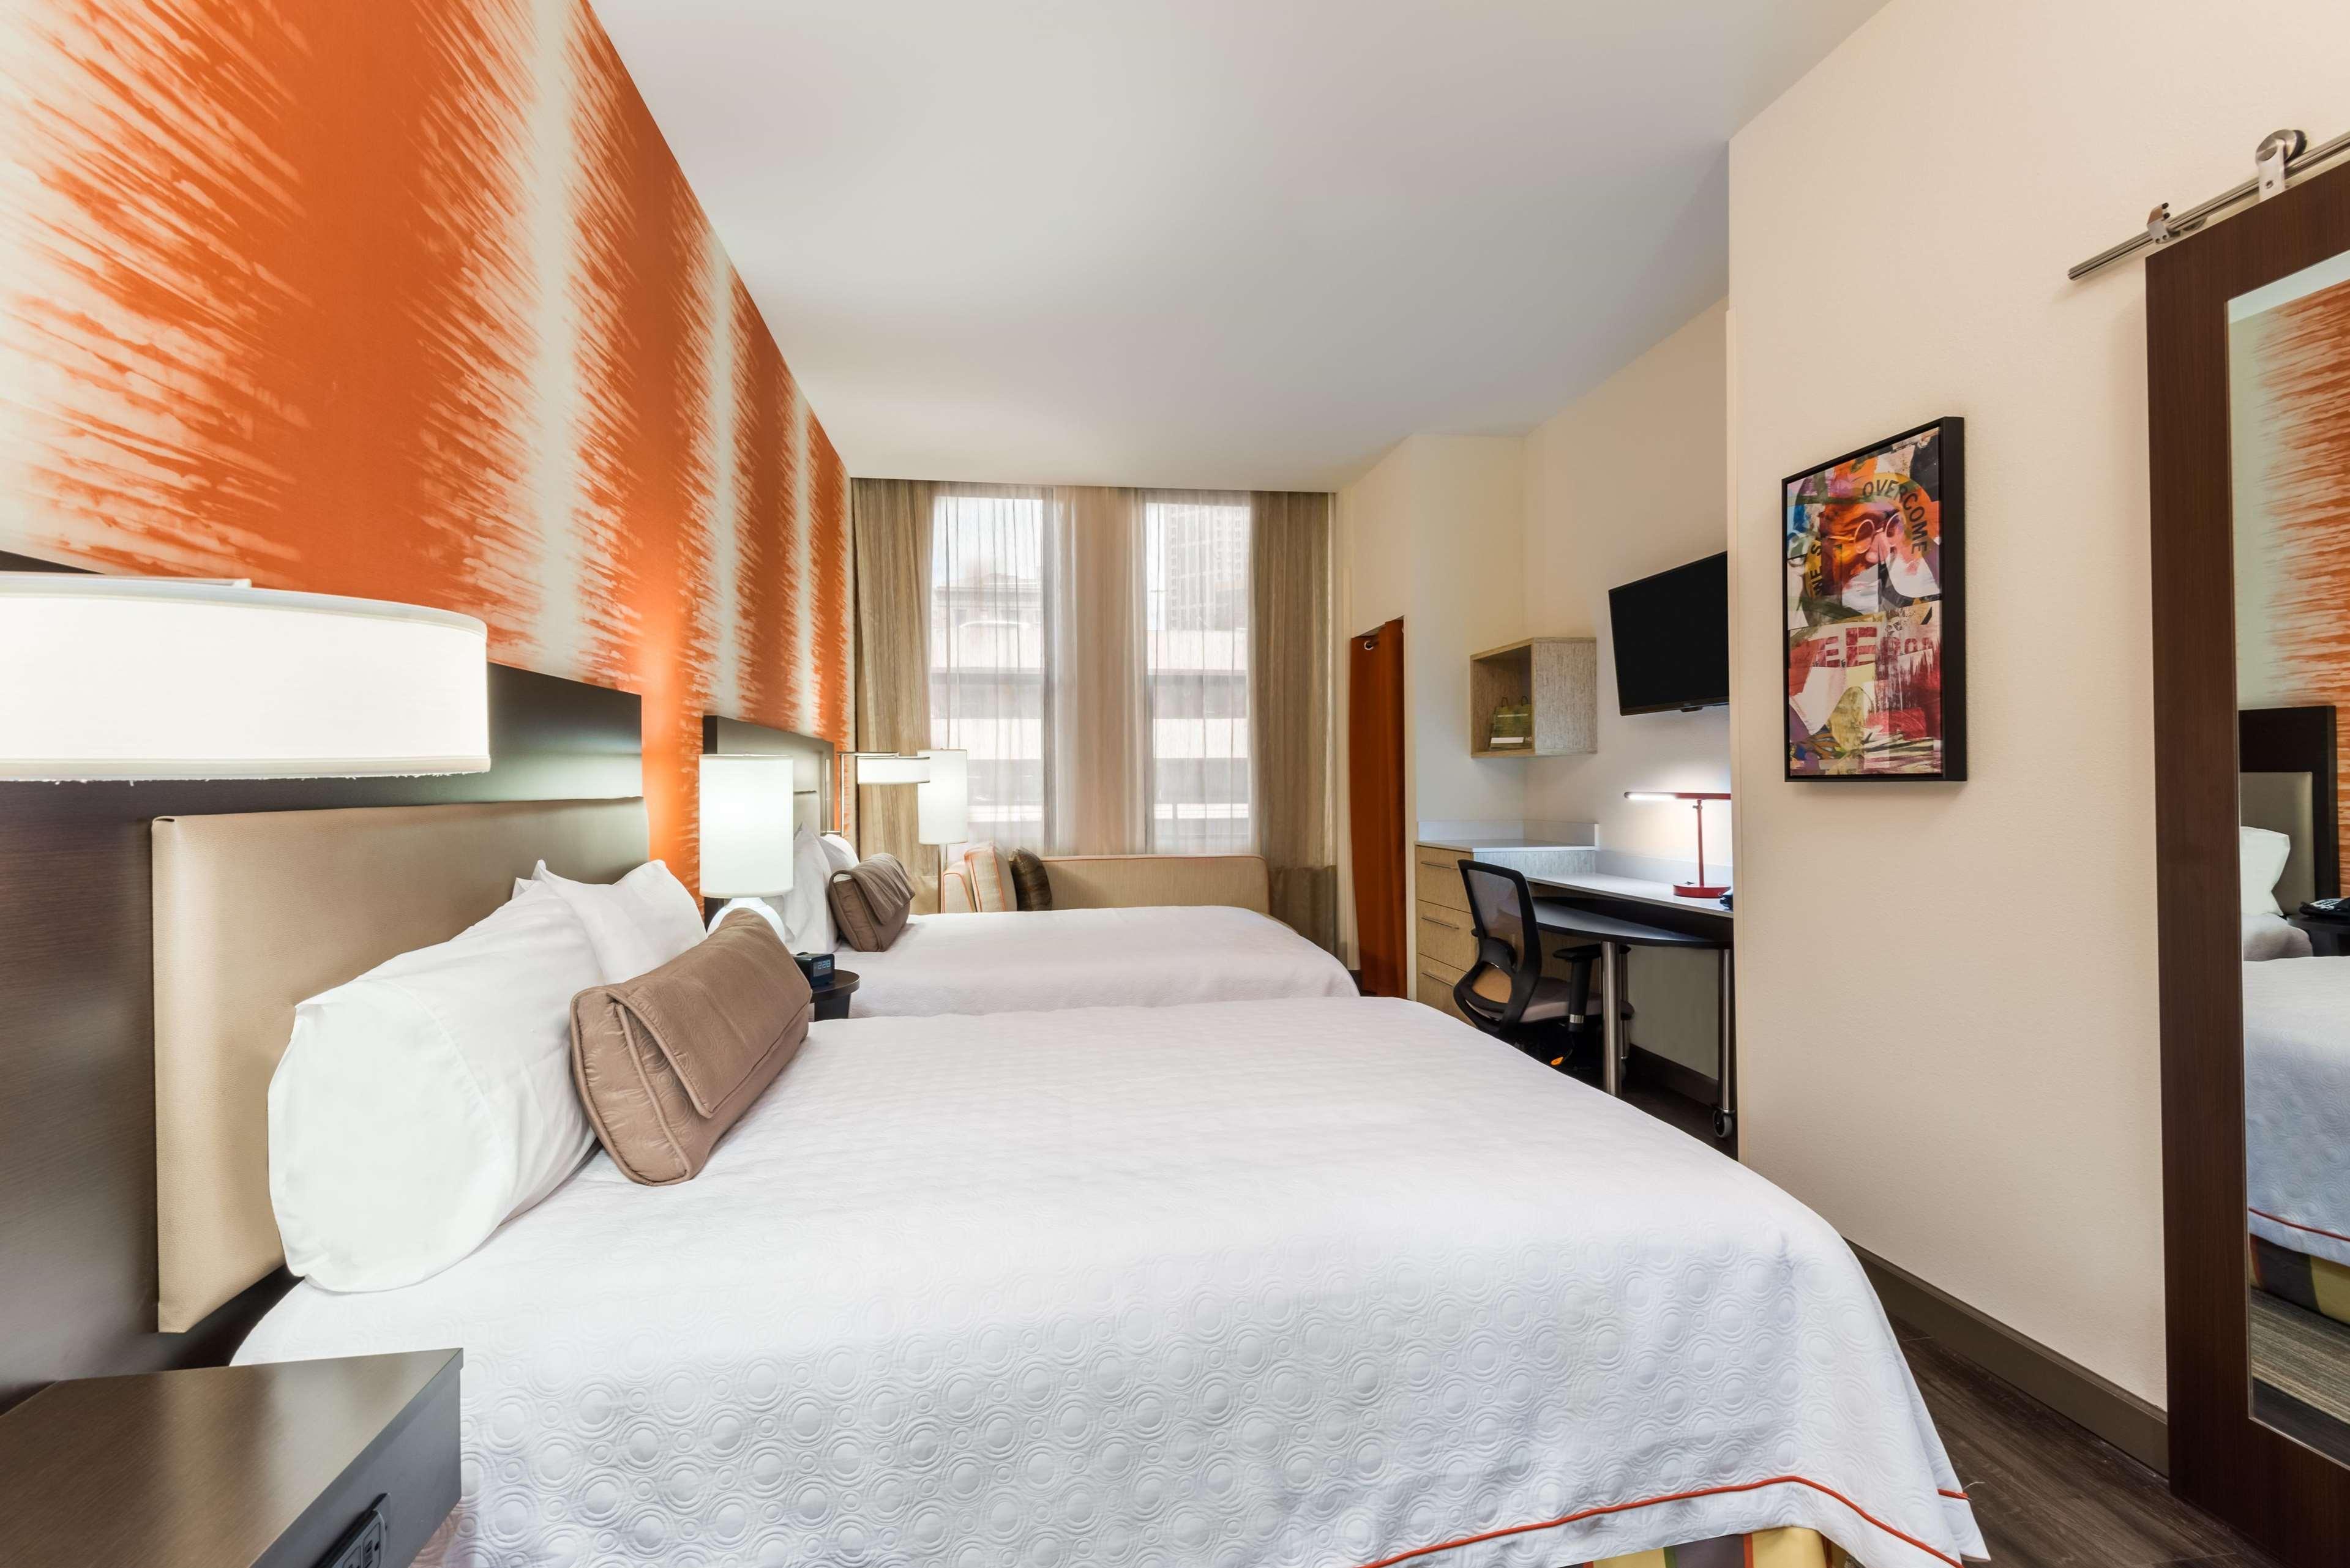 Home2 Suites by Hilton Atlanta Downtown image 5